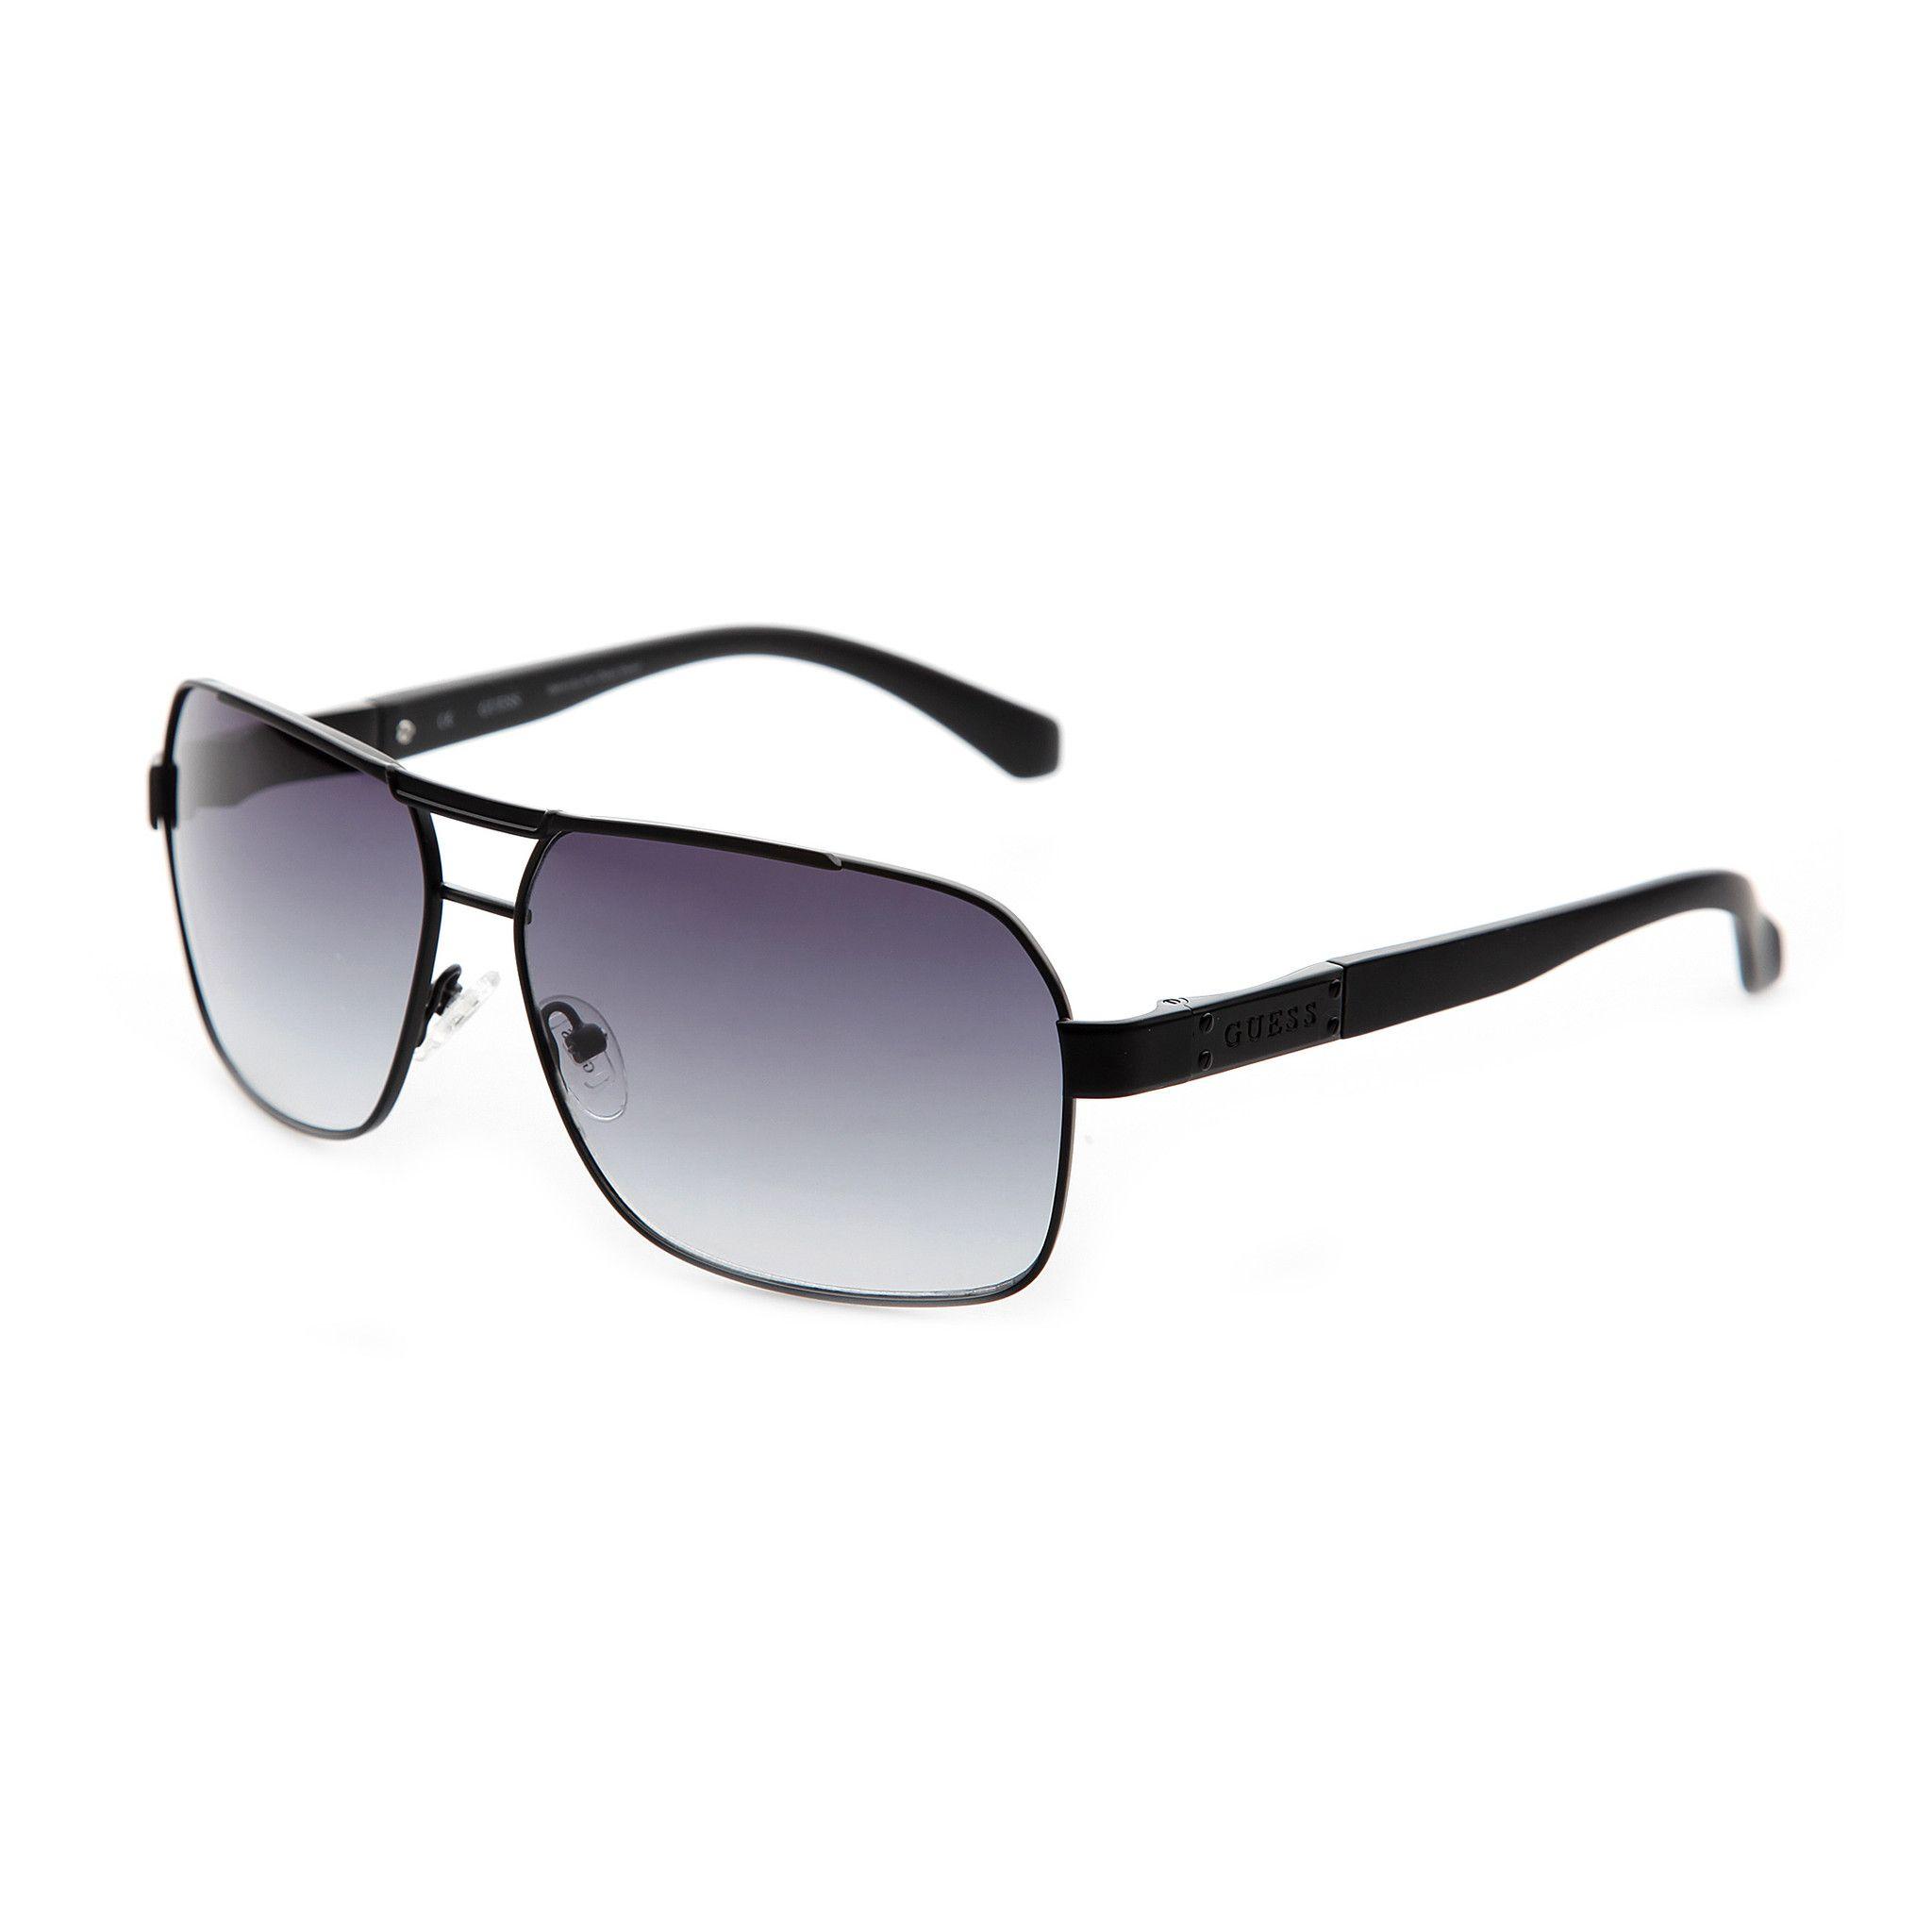 Guess Men Sunglasses | The Nora